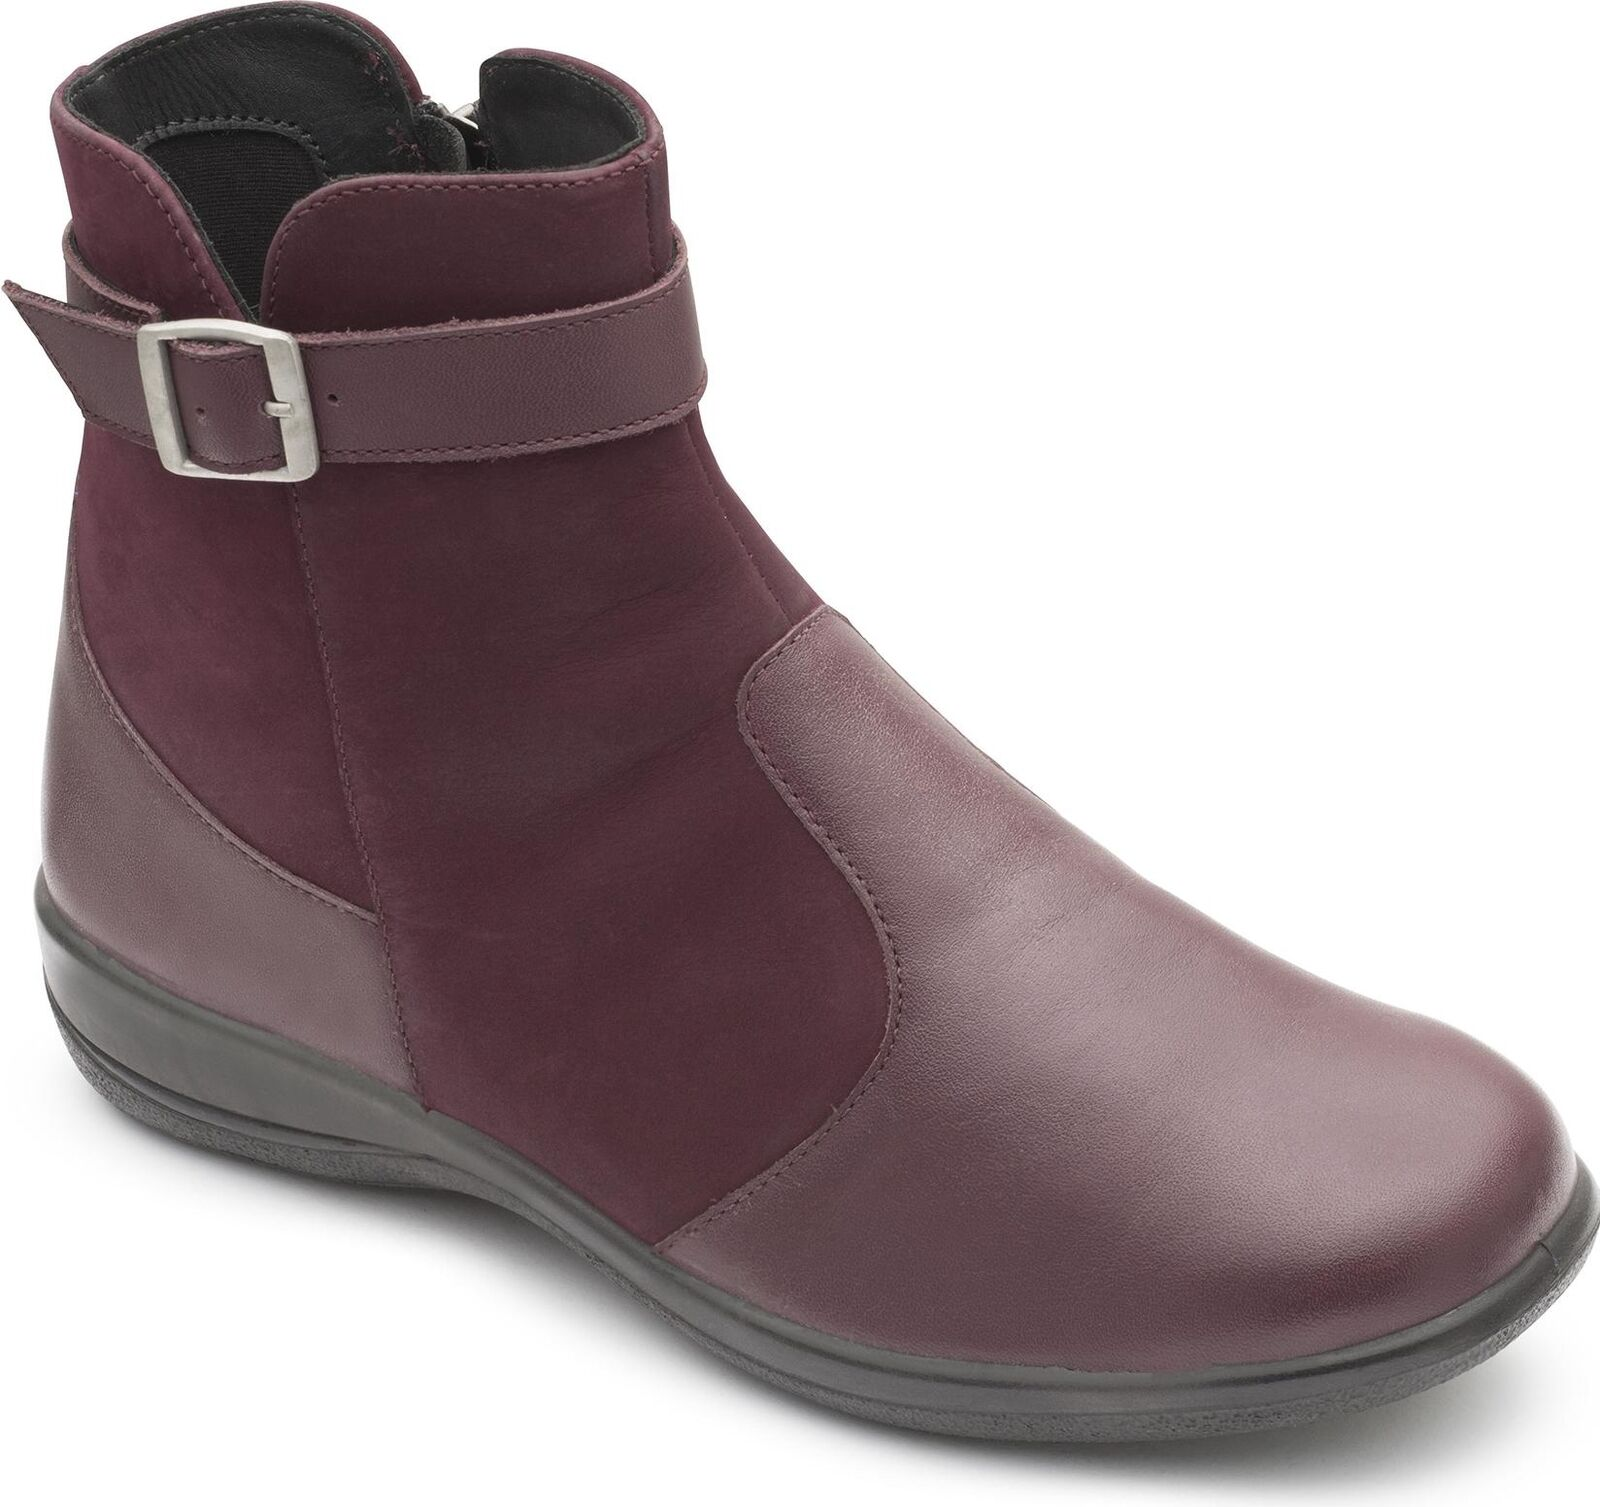 Padders Mary Señoras Para Mujer Calce De Cuero Calce Mujer Extra Ancho Doble (2E 3E) botas al Tobillo Ciruela 0df762